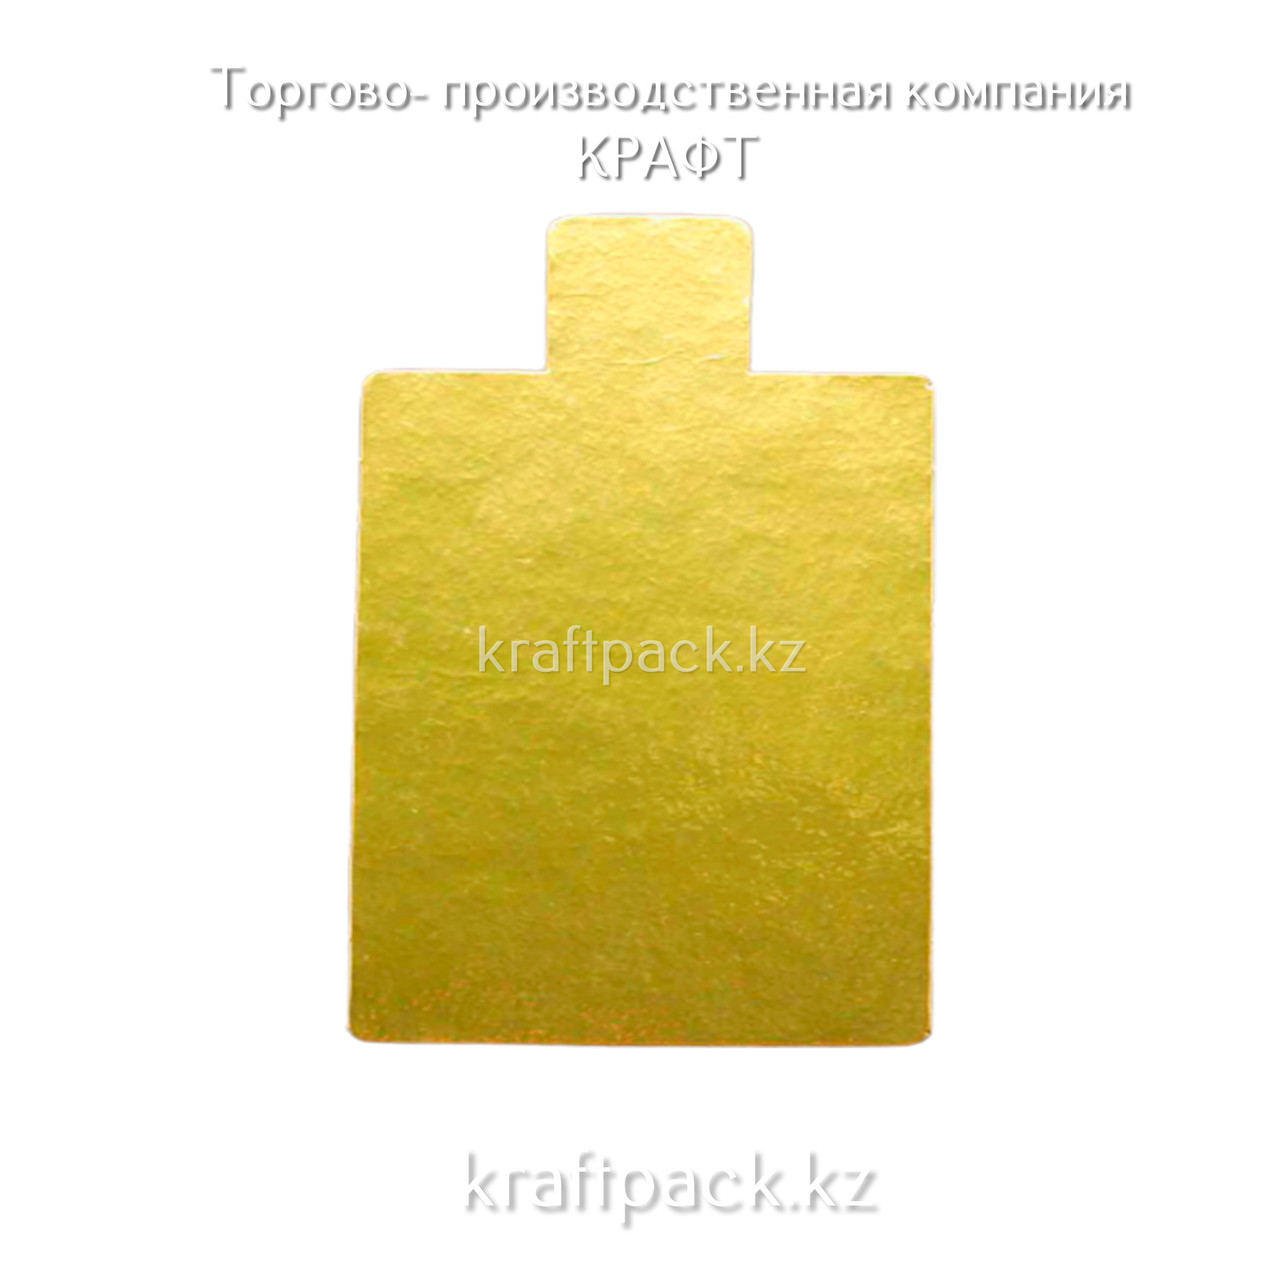 Pasticciere.Подложка золото  с держателем 75х75 мм (толщина 0,8) (100 шт/упак.)